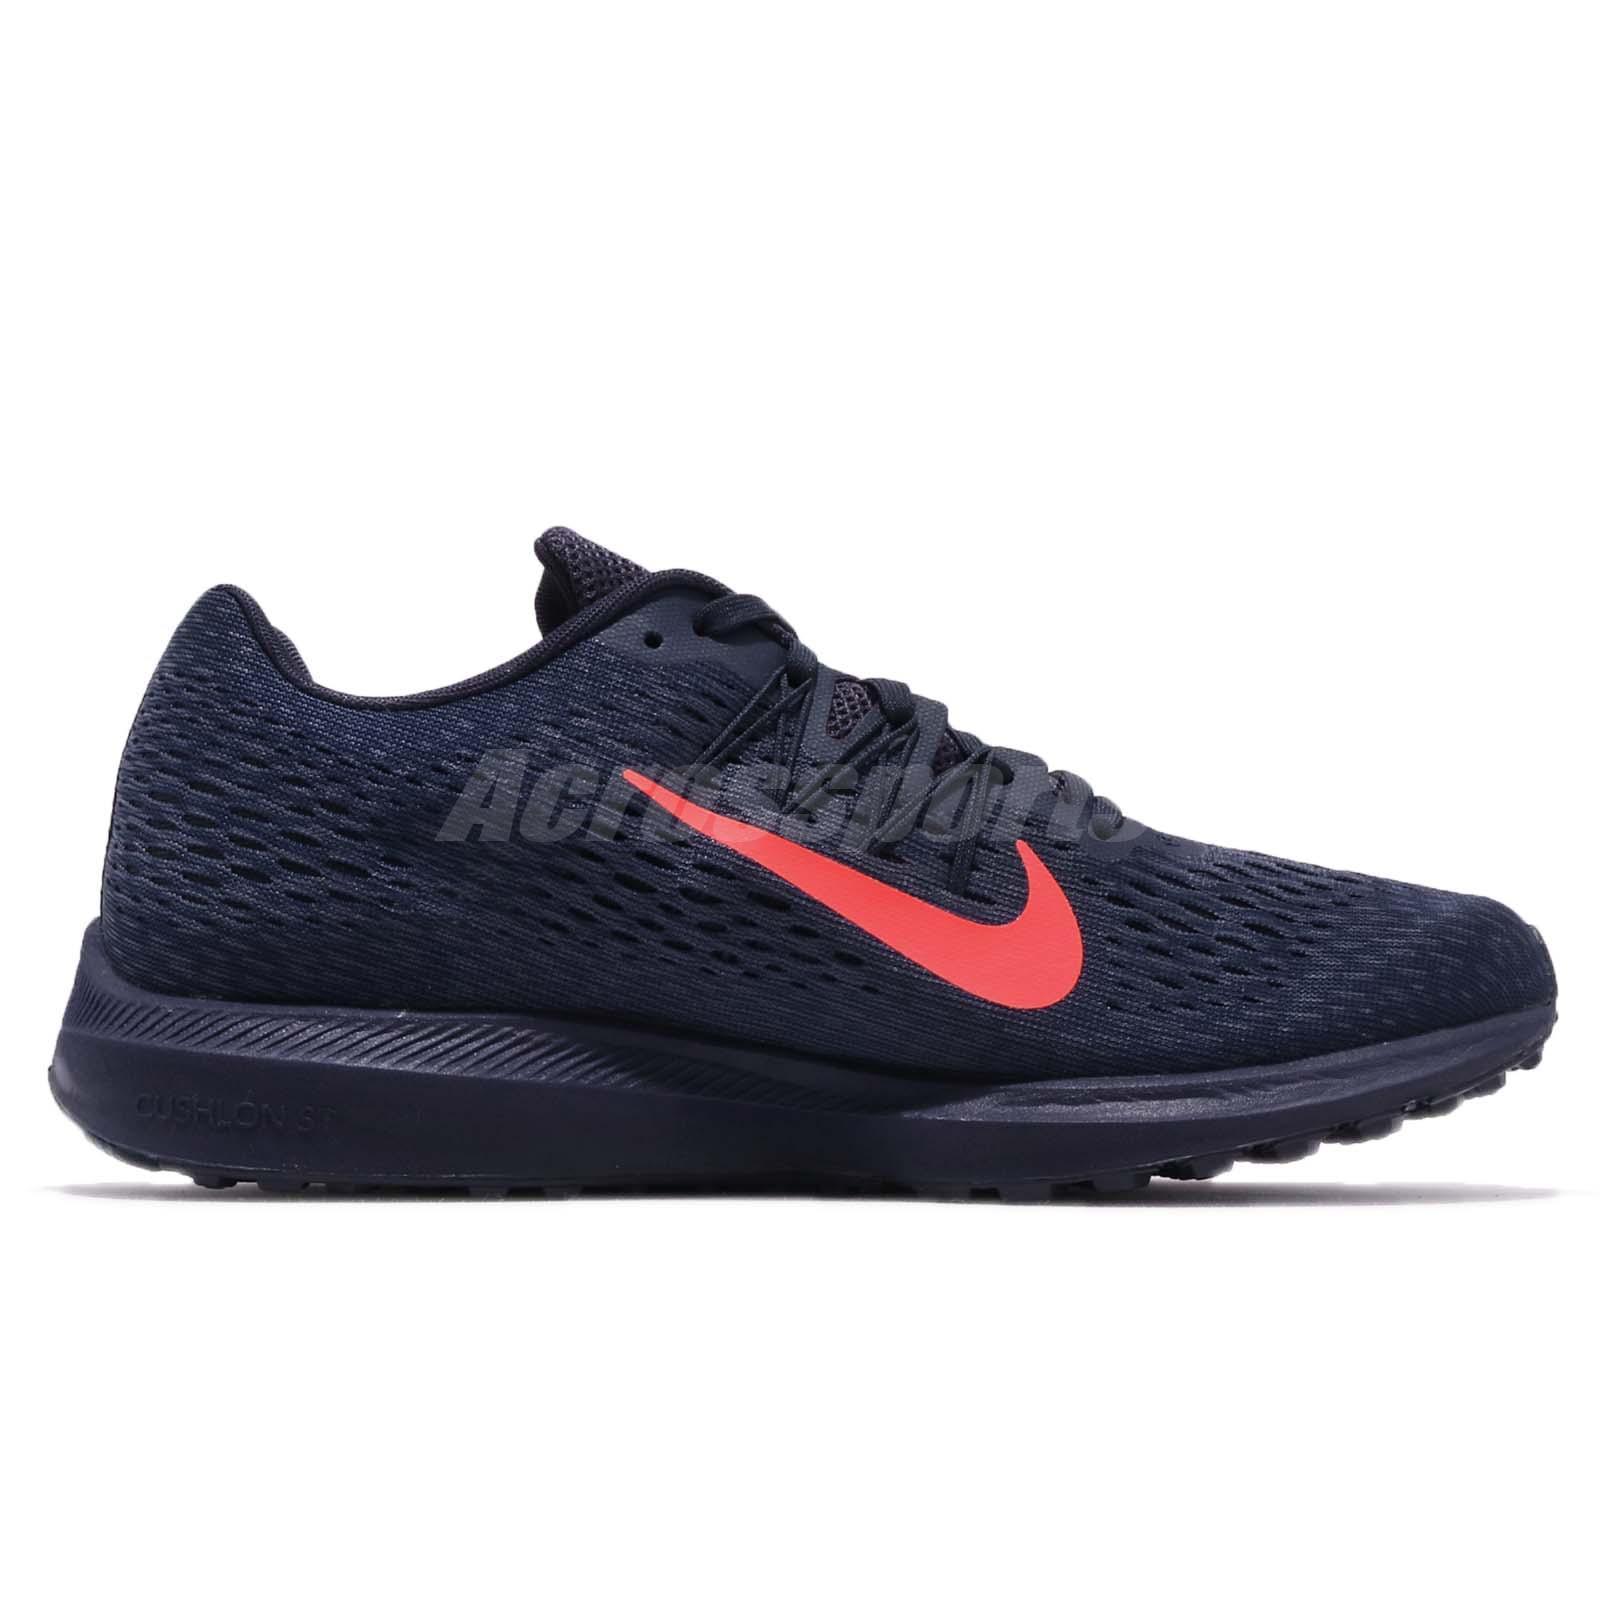 Nike Zoom Winflo 5 V Blackened Blue